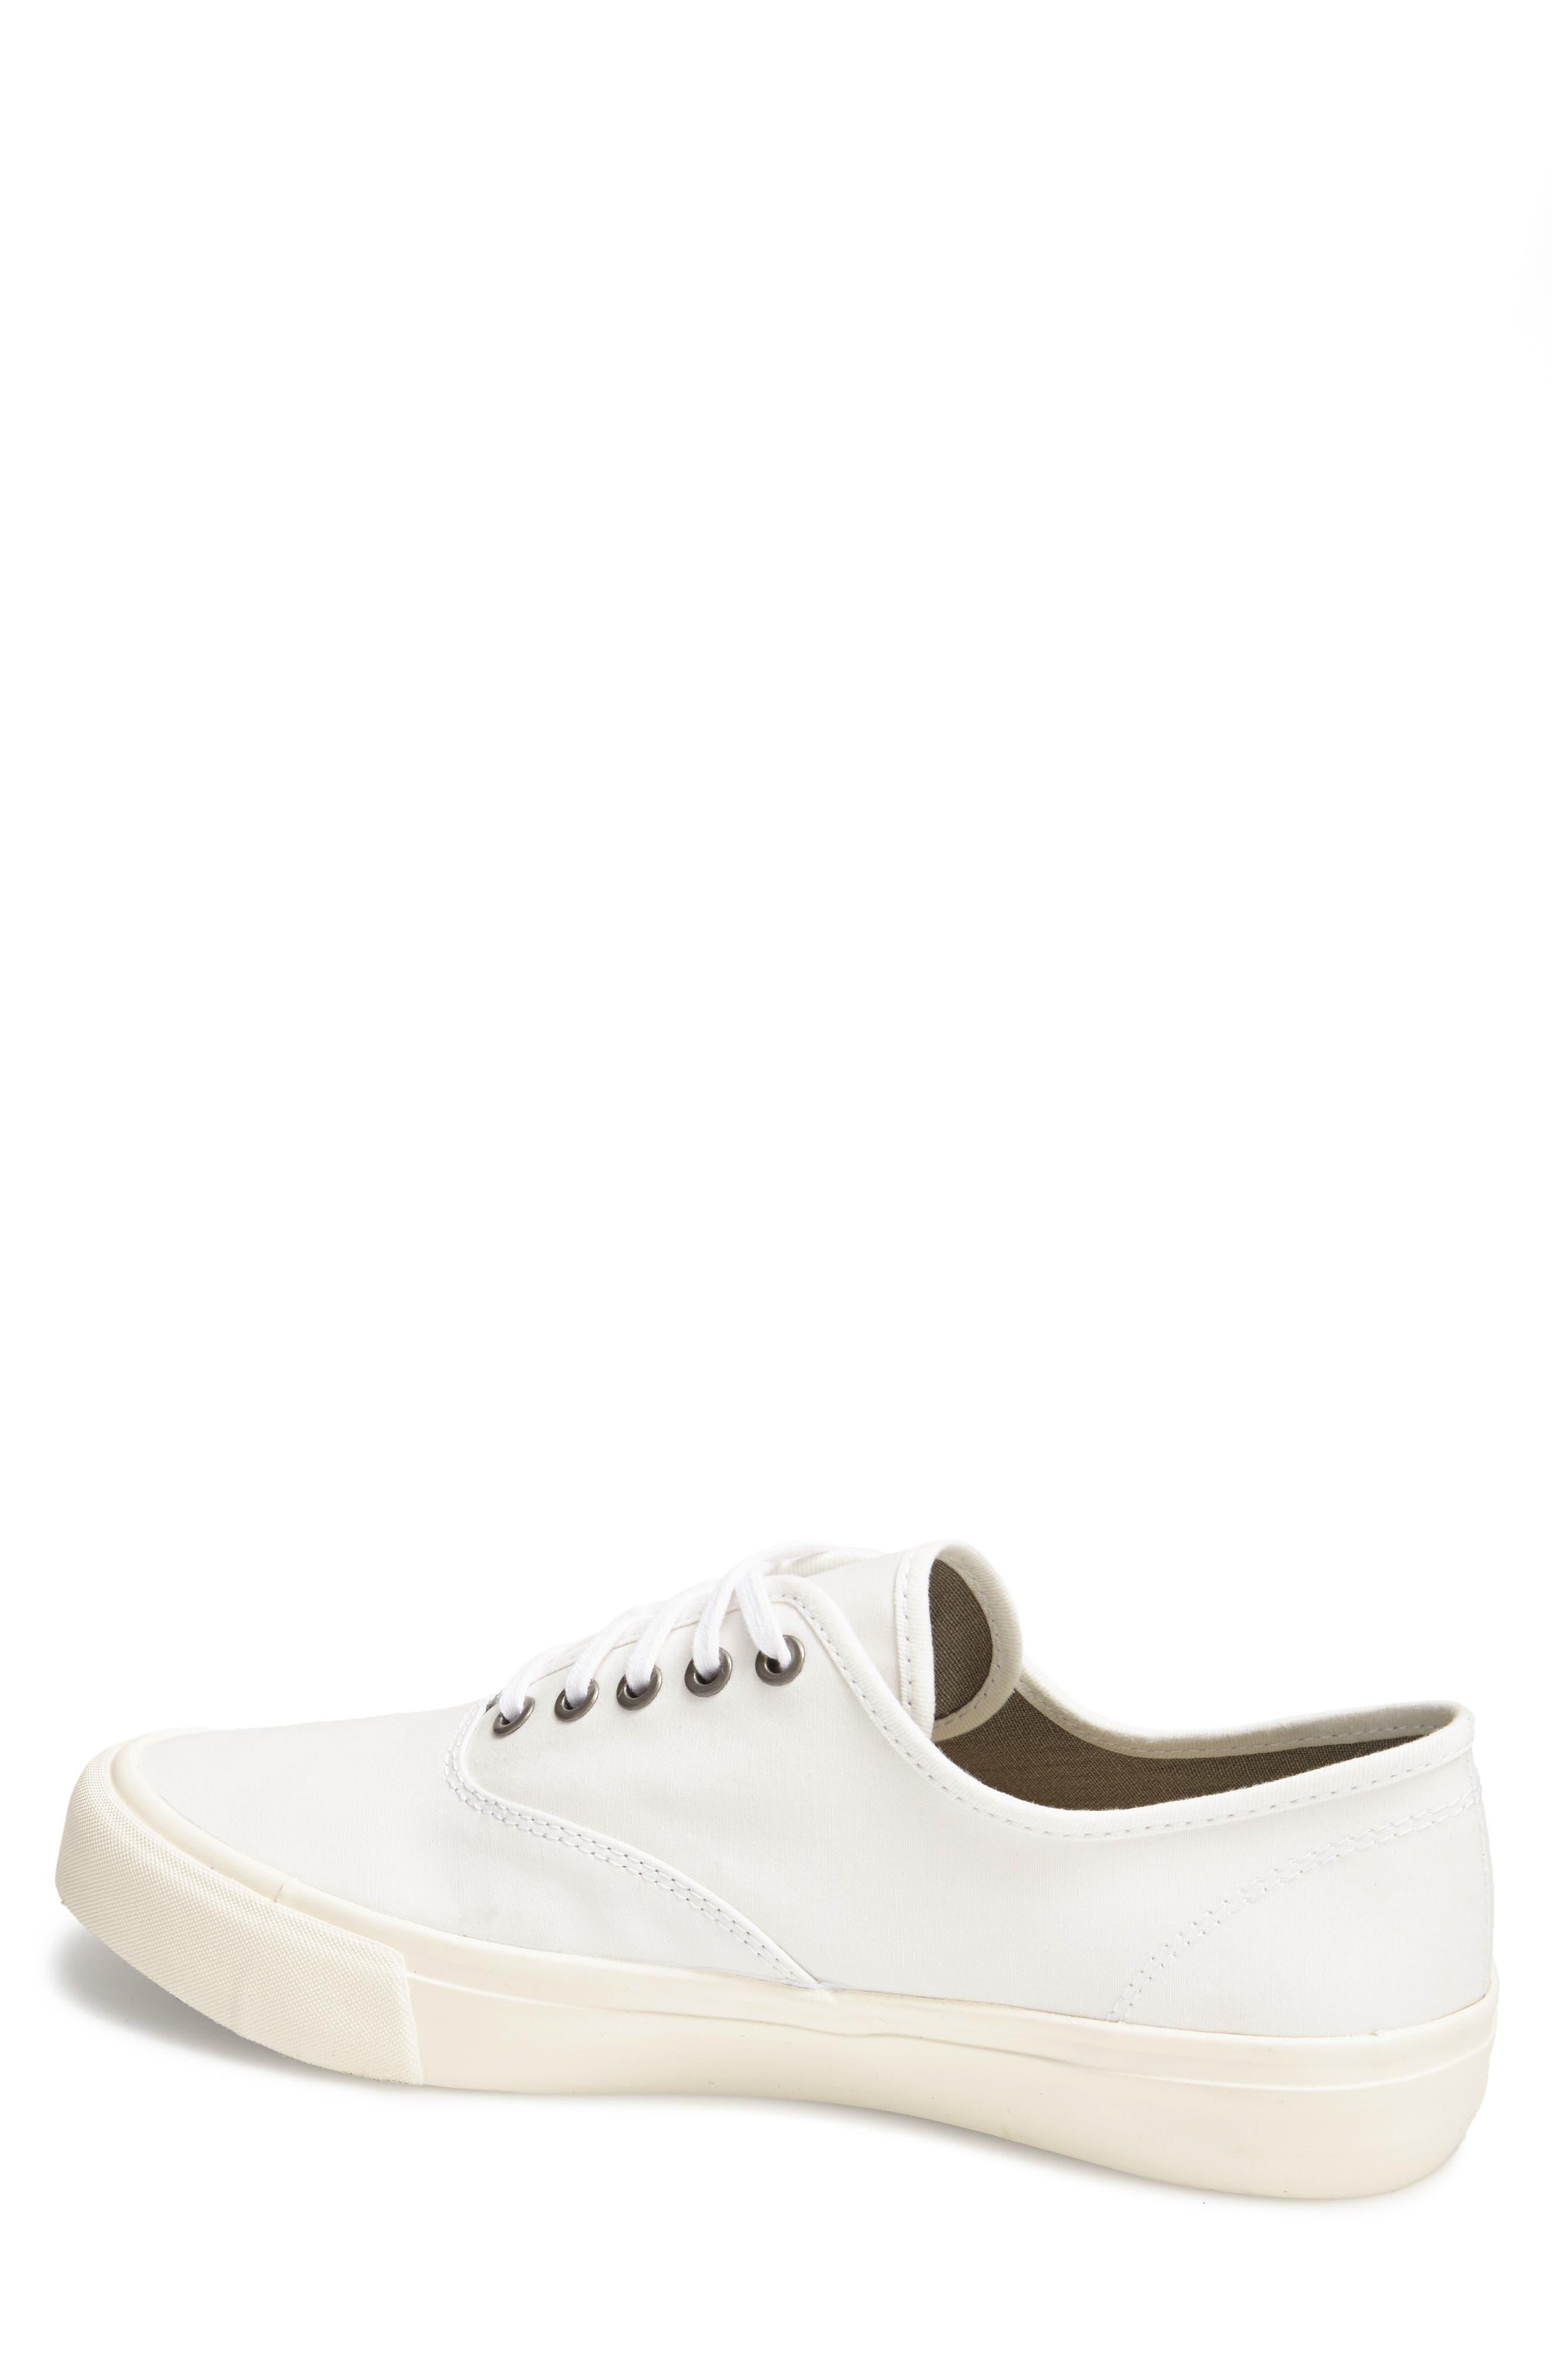 Legend Standard Sneaker,                             Alternate thumbnail 2, color,                             BLEACH